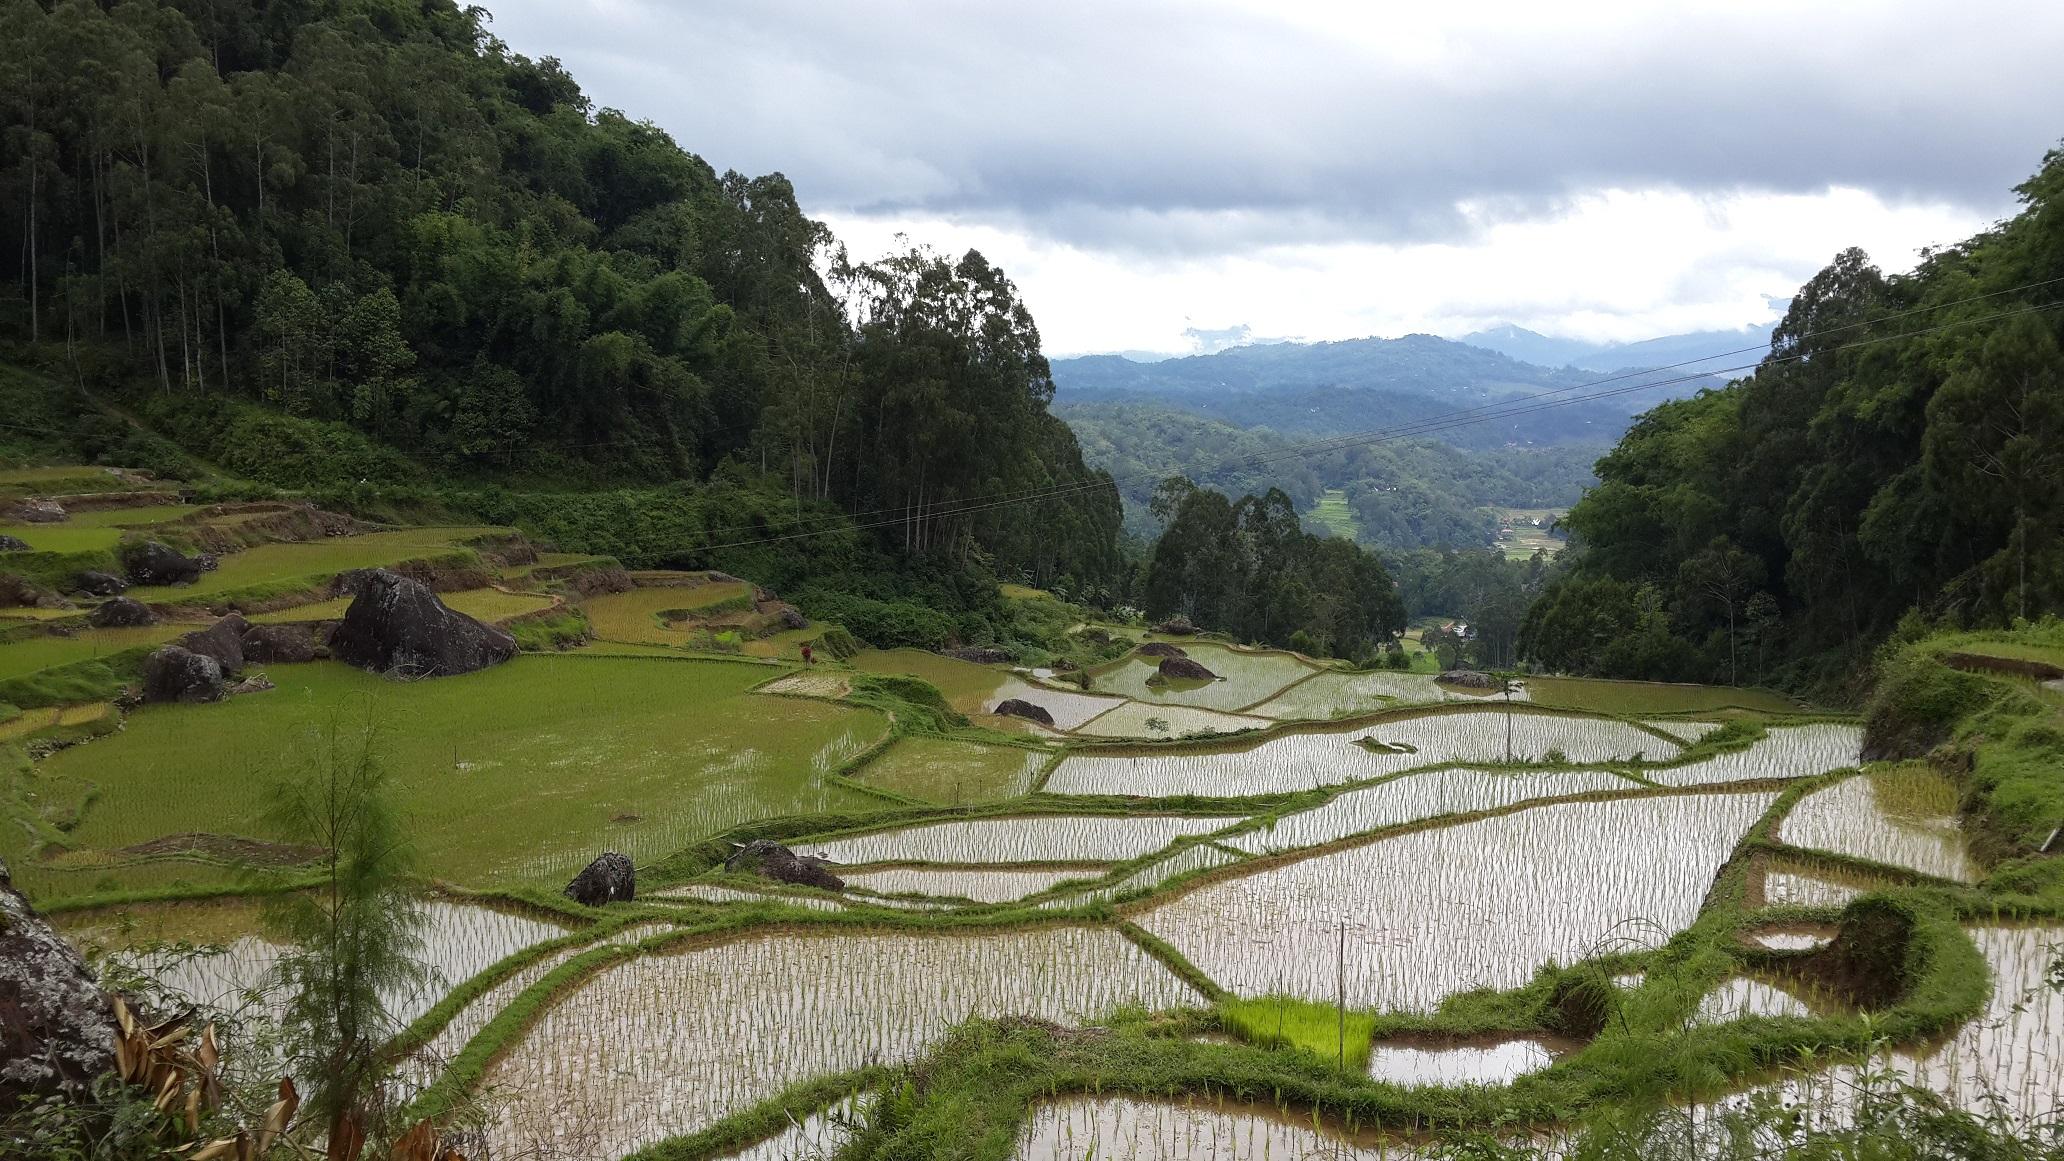 Tana Toraja Rice Terrace in South Sulawesi